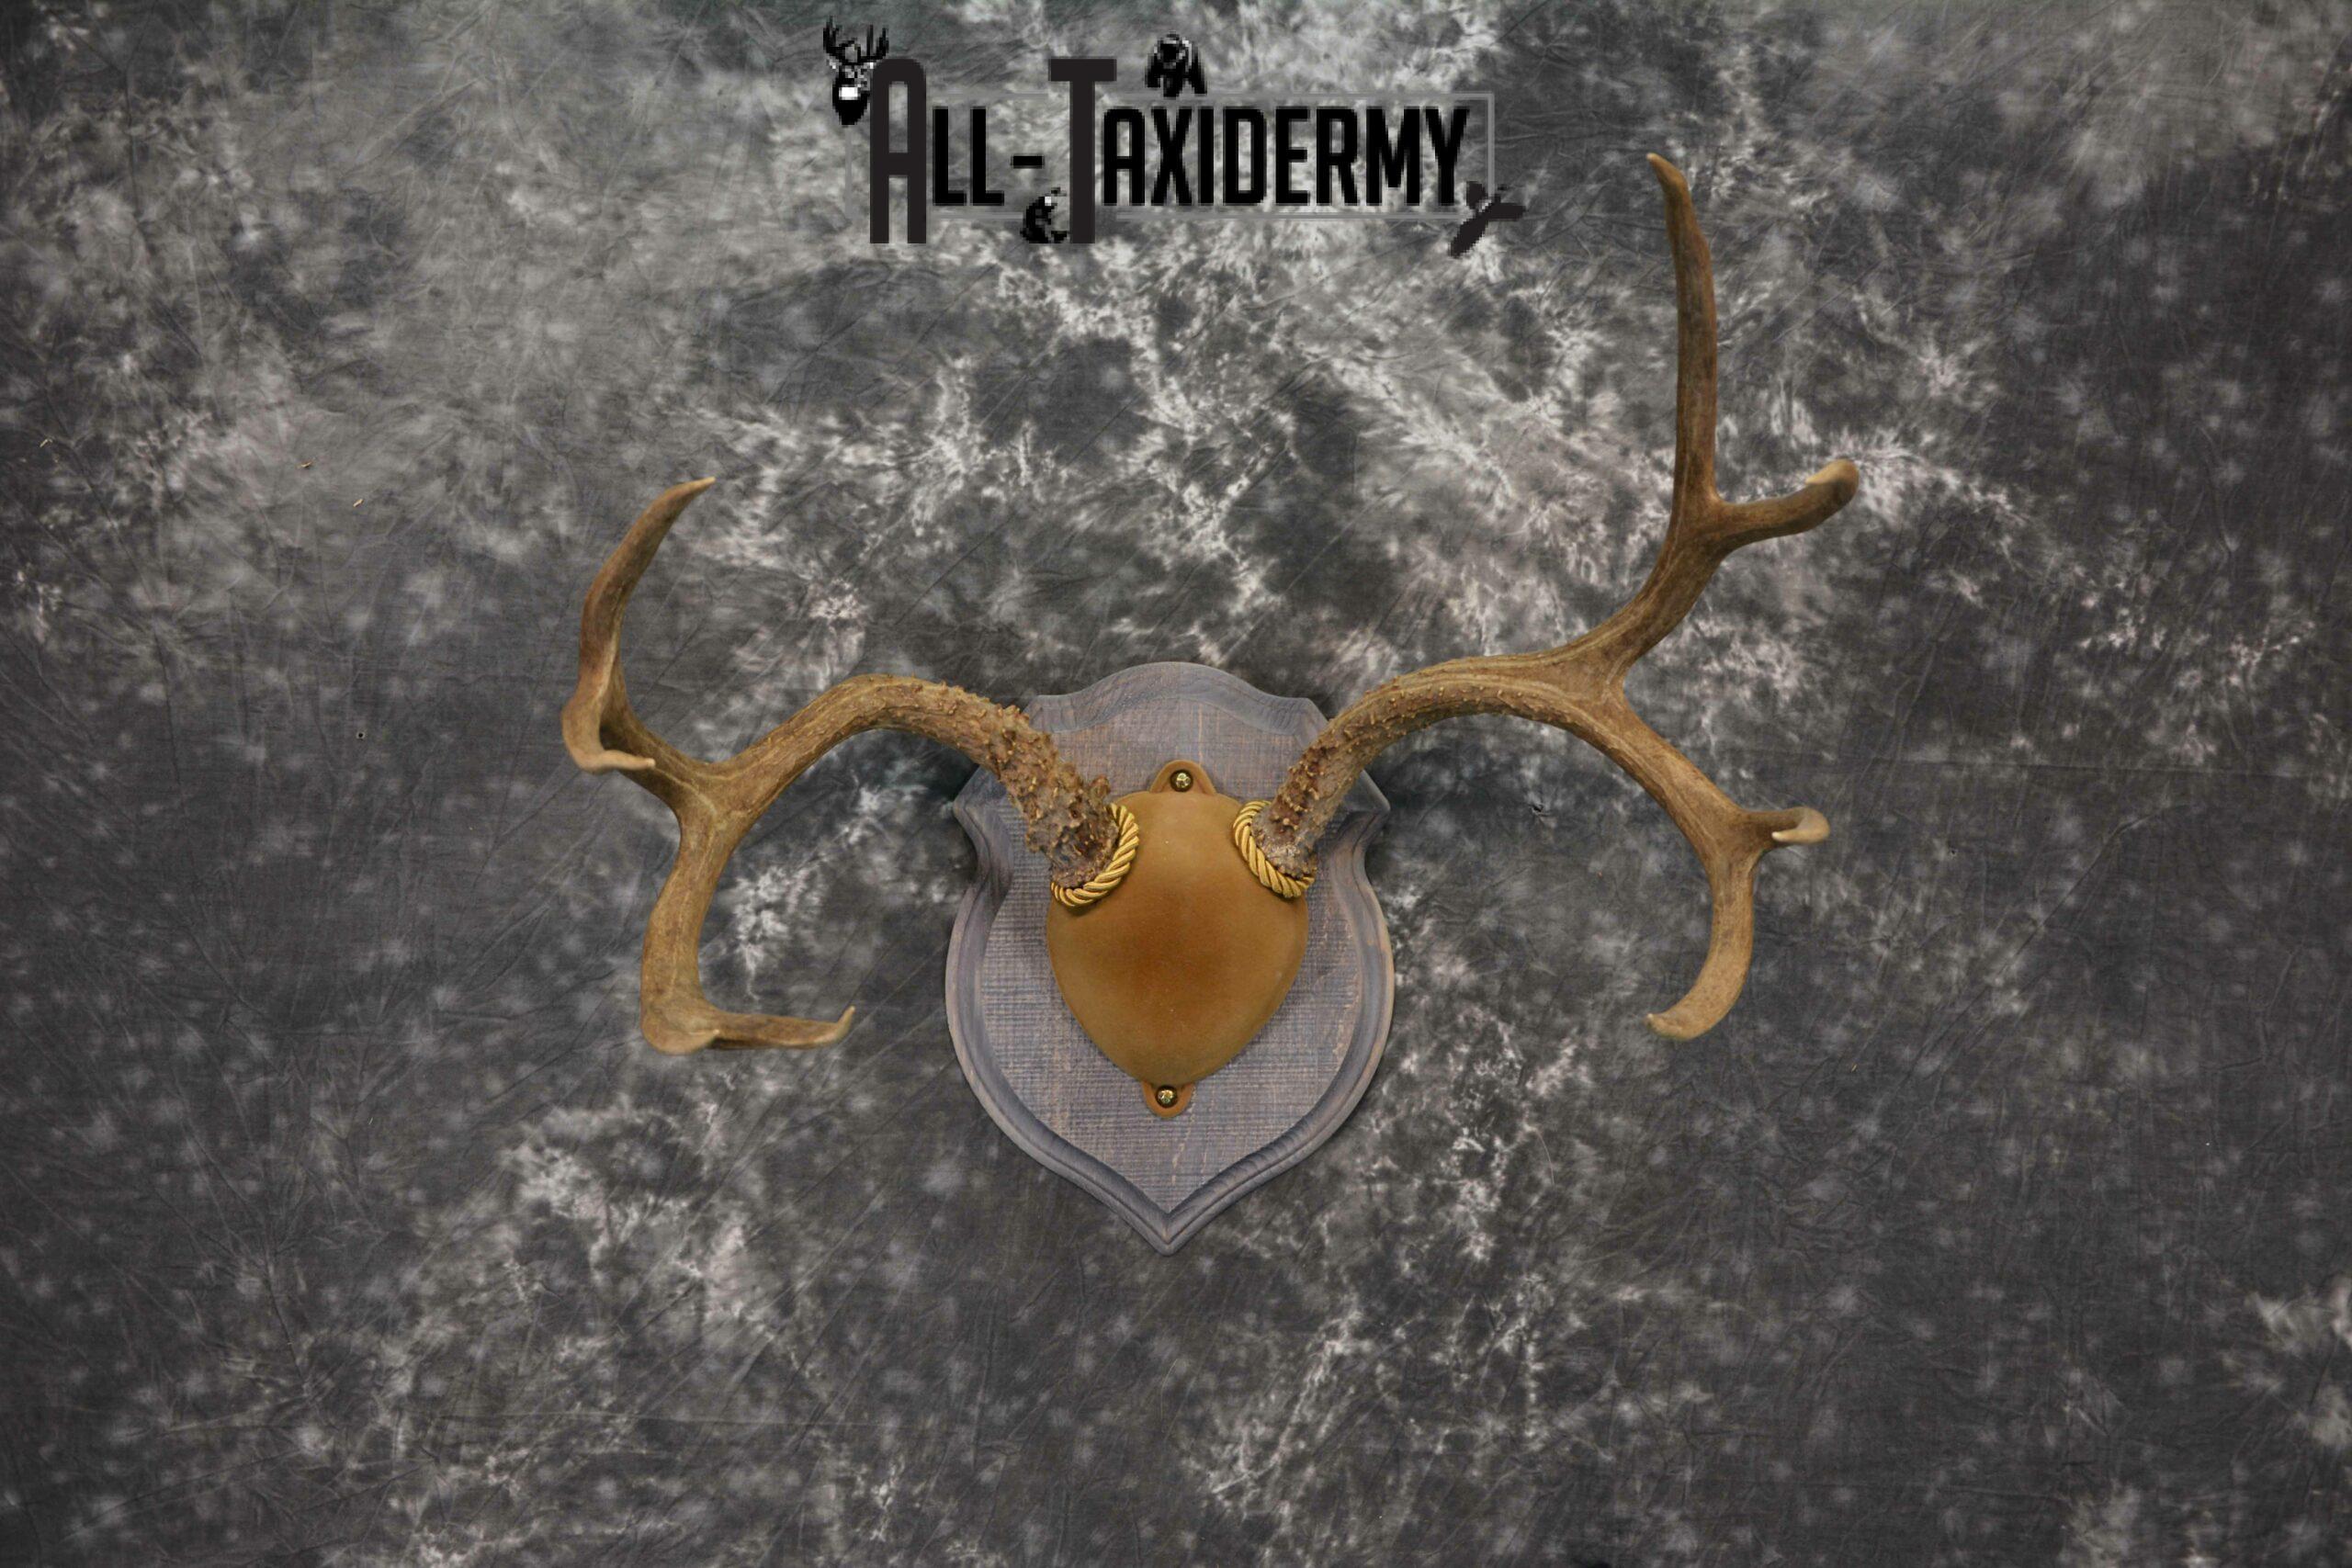 Mule Deer Antler base plaque taxidermy mount for sale SKU 1188